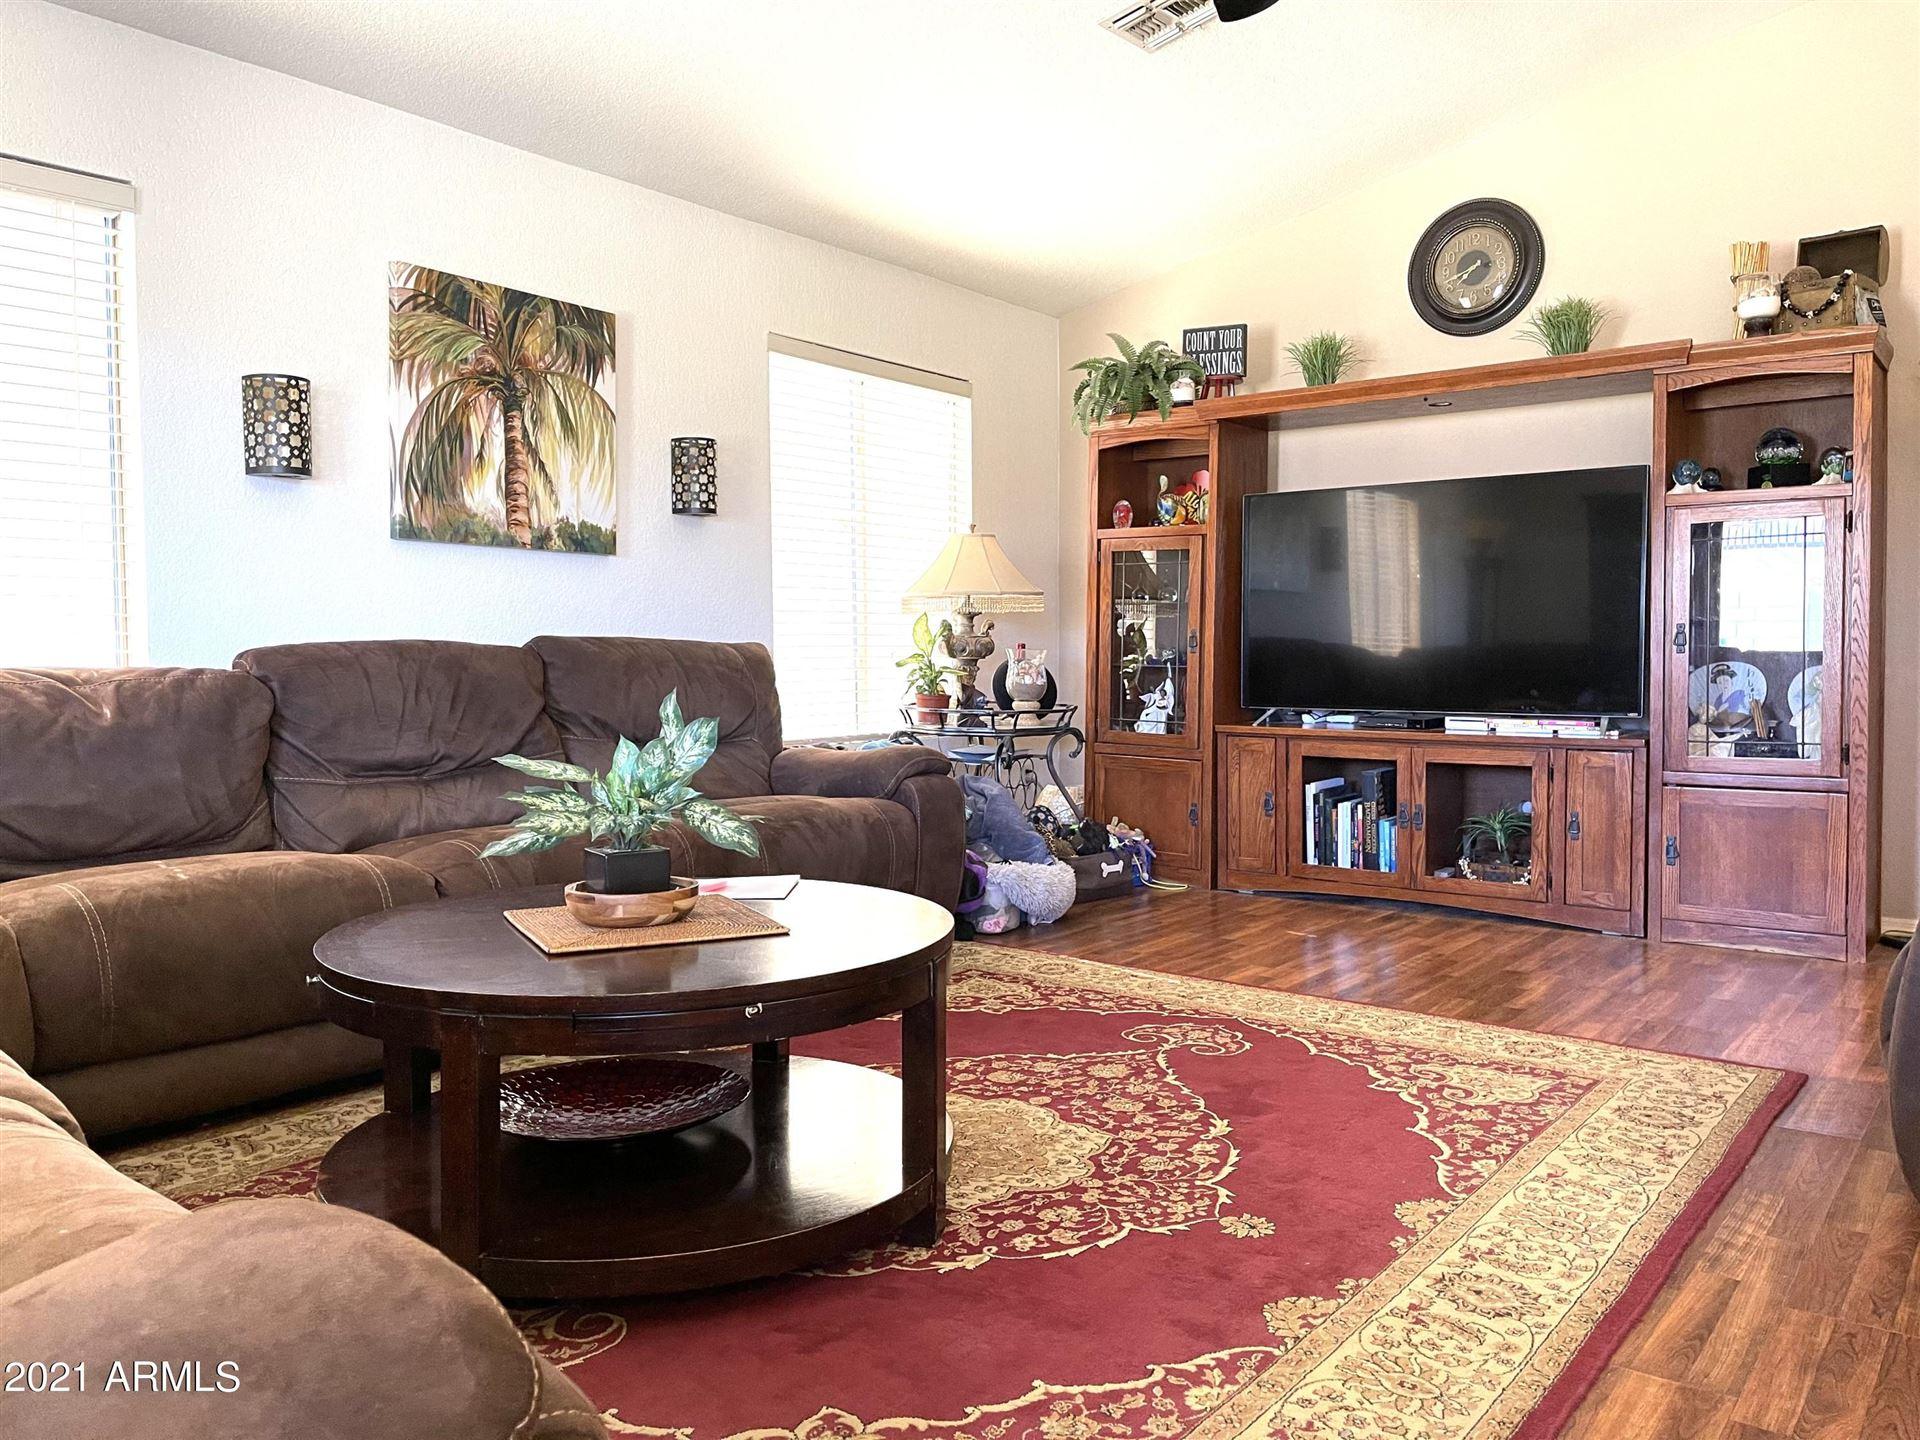 Photo of 5605 S 14TH Way, Phoenix, AZ 85040 (MLS # 6199954)